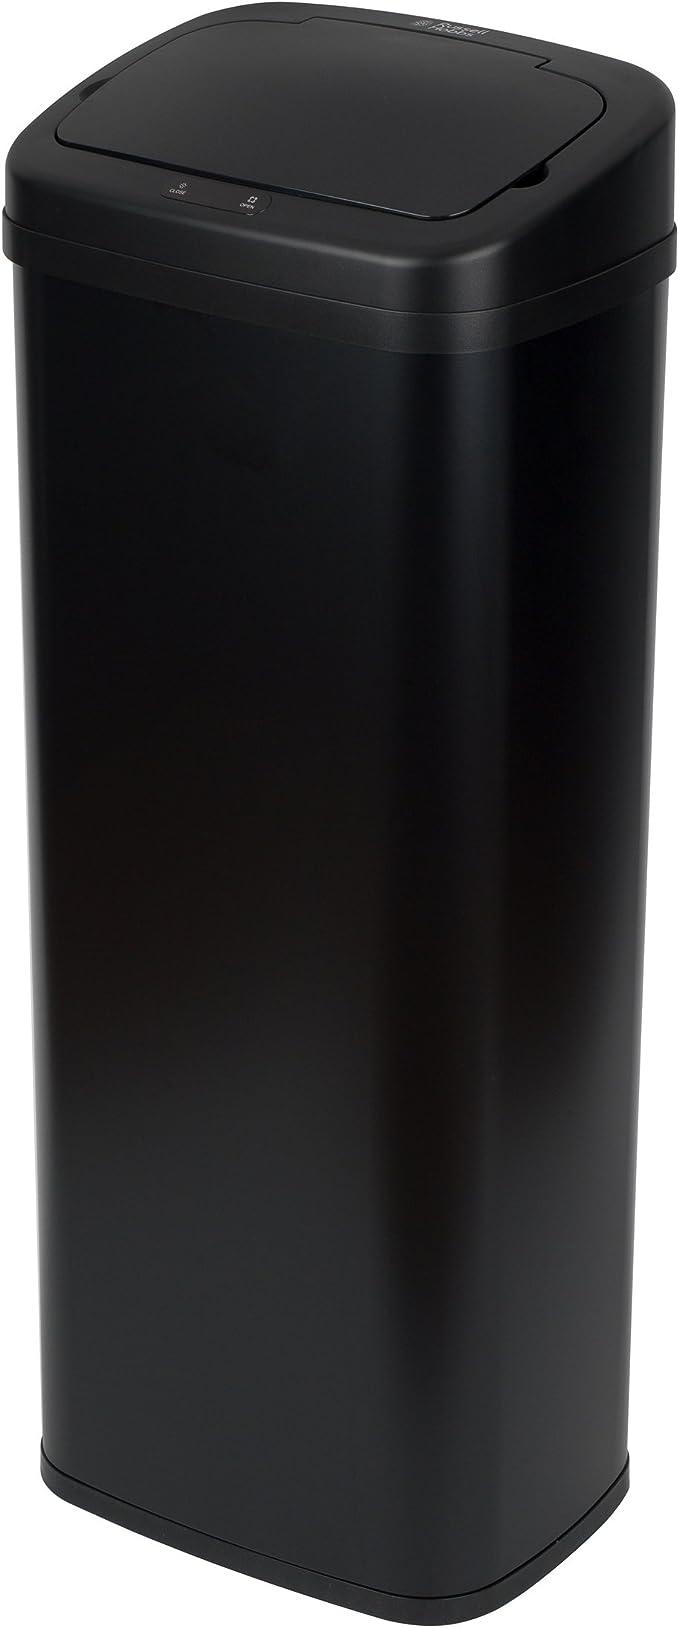 Nero Russell Hobbs BW07125MOB Quadrato sensore Bin 71/x 24 50/Litri